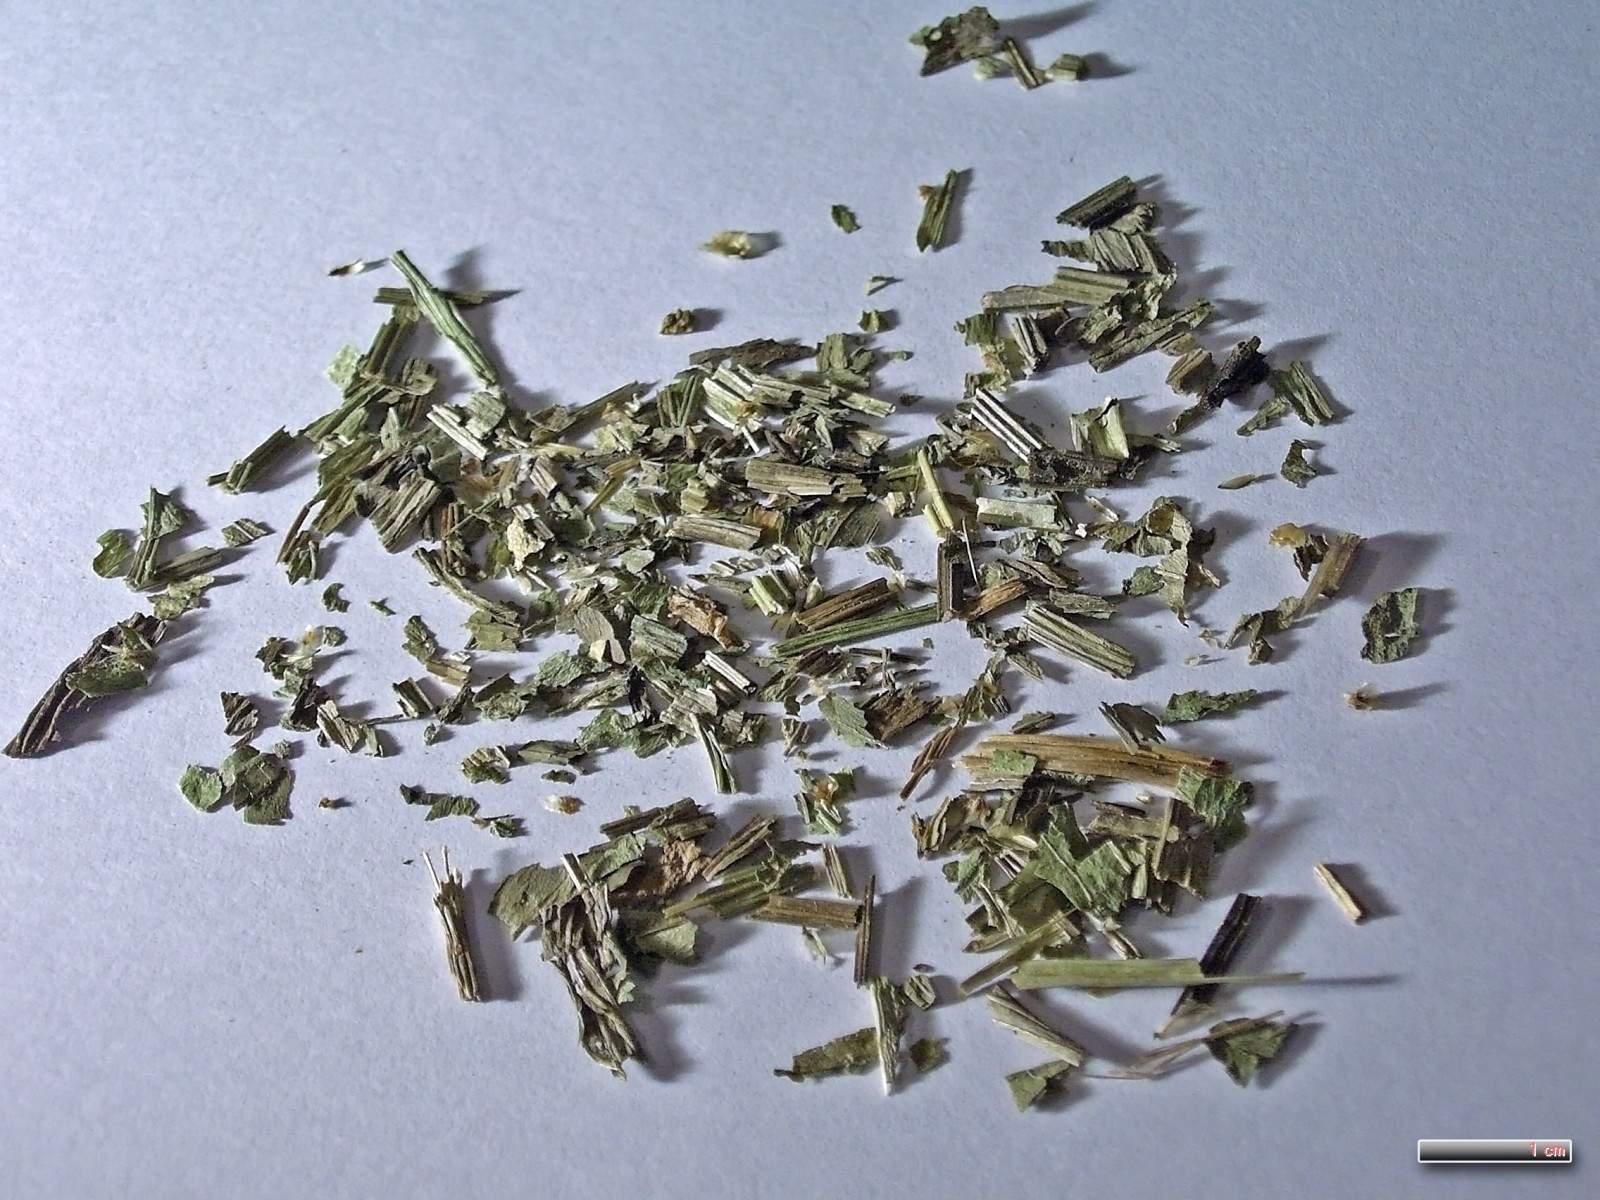 Plantaginis lanceolatae herba